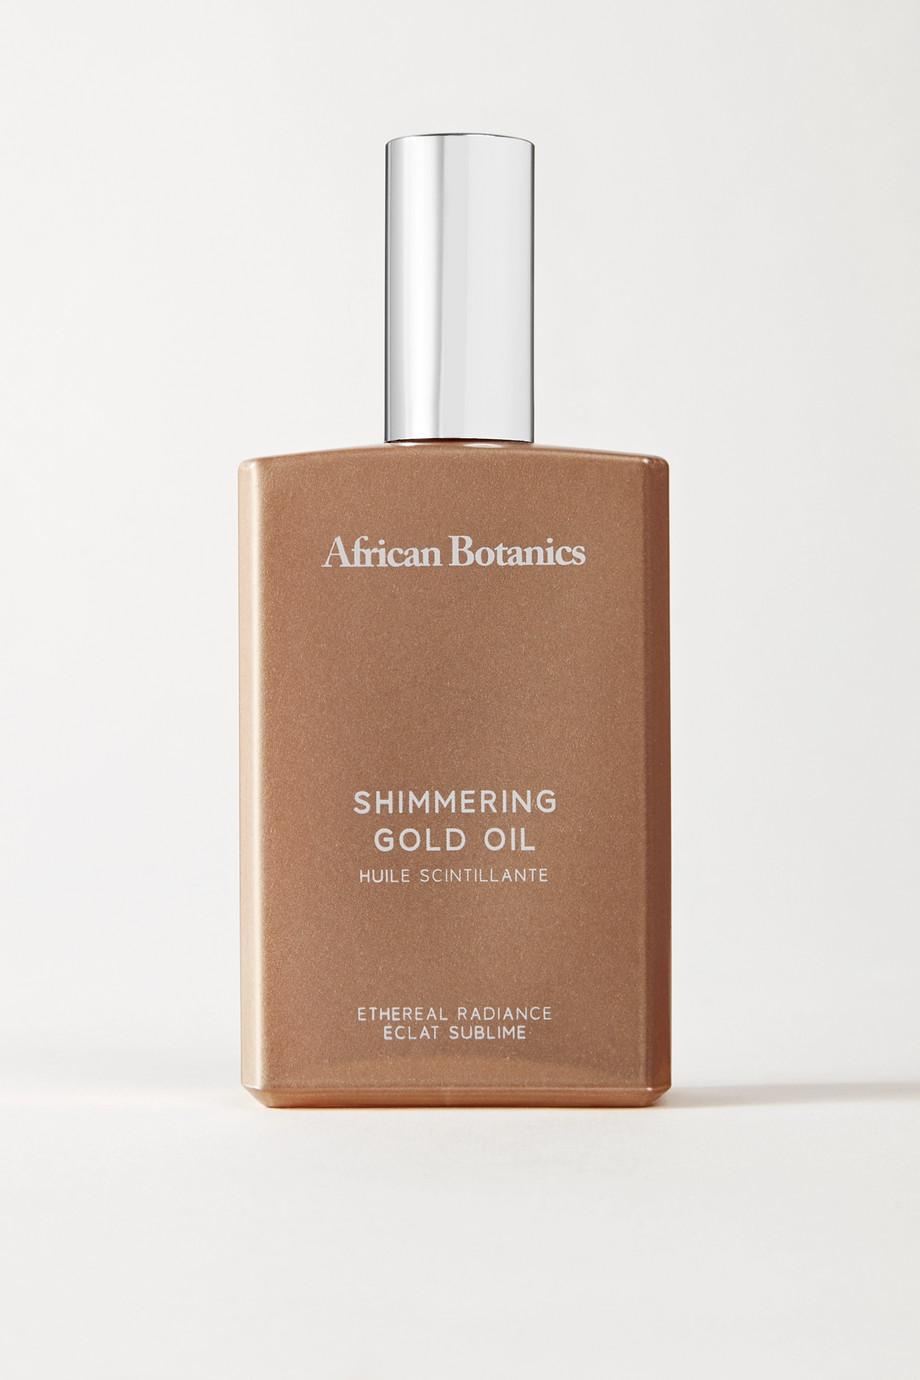 African Botanics Marula Shimmering Gold Oil, 100ml